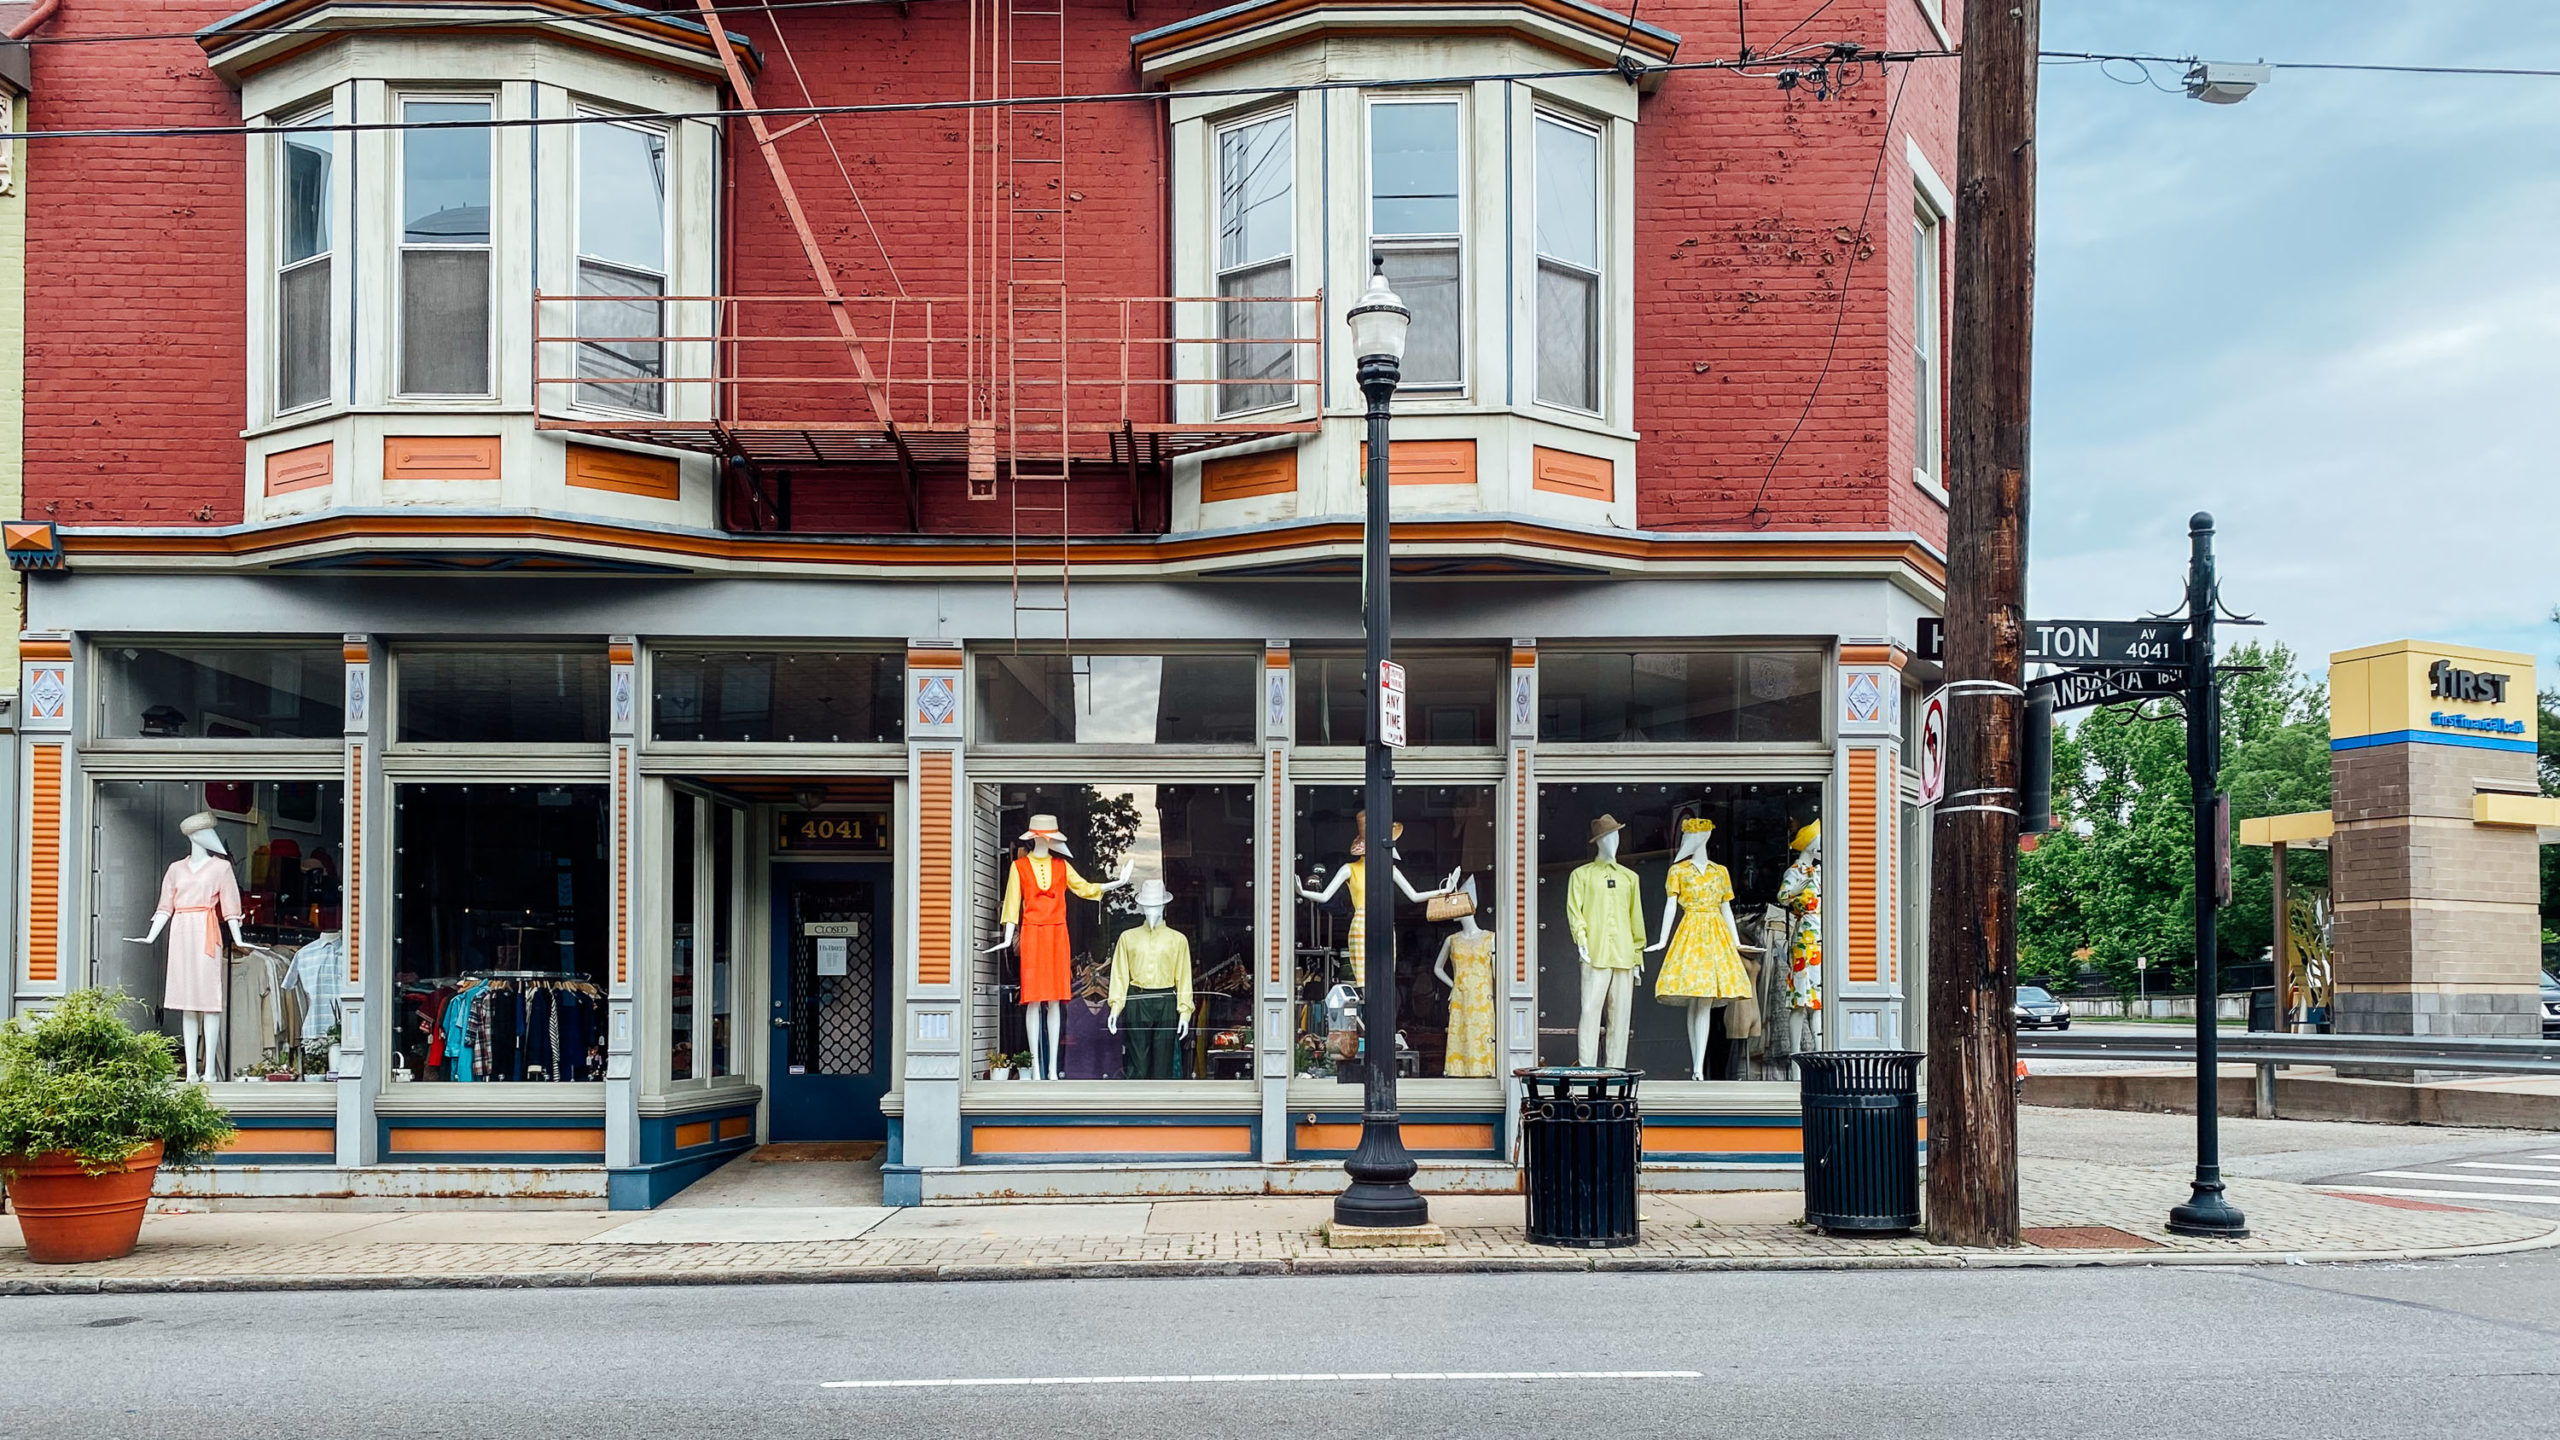 Storefront in Northside Ohio